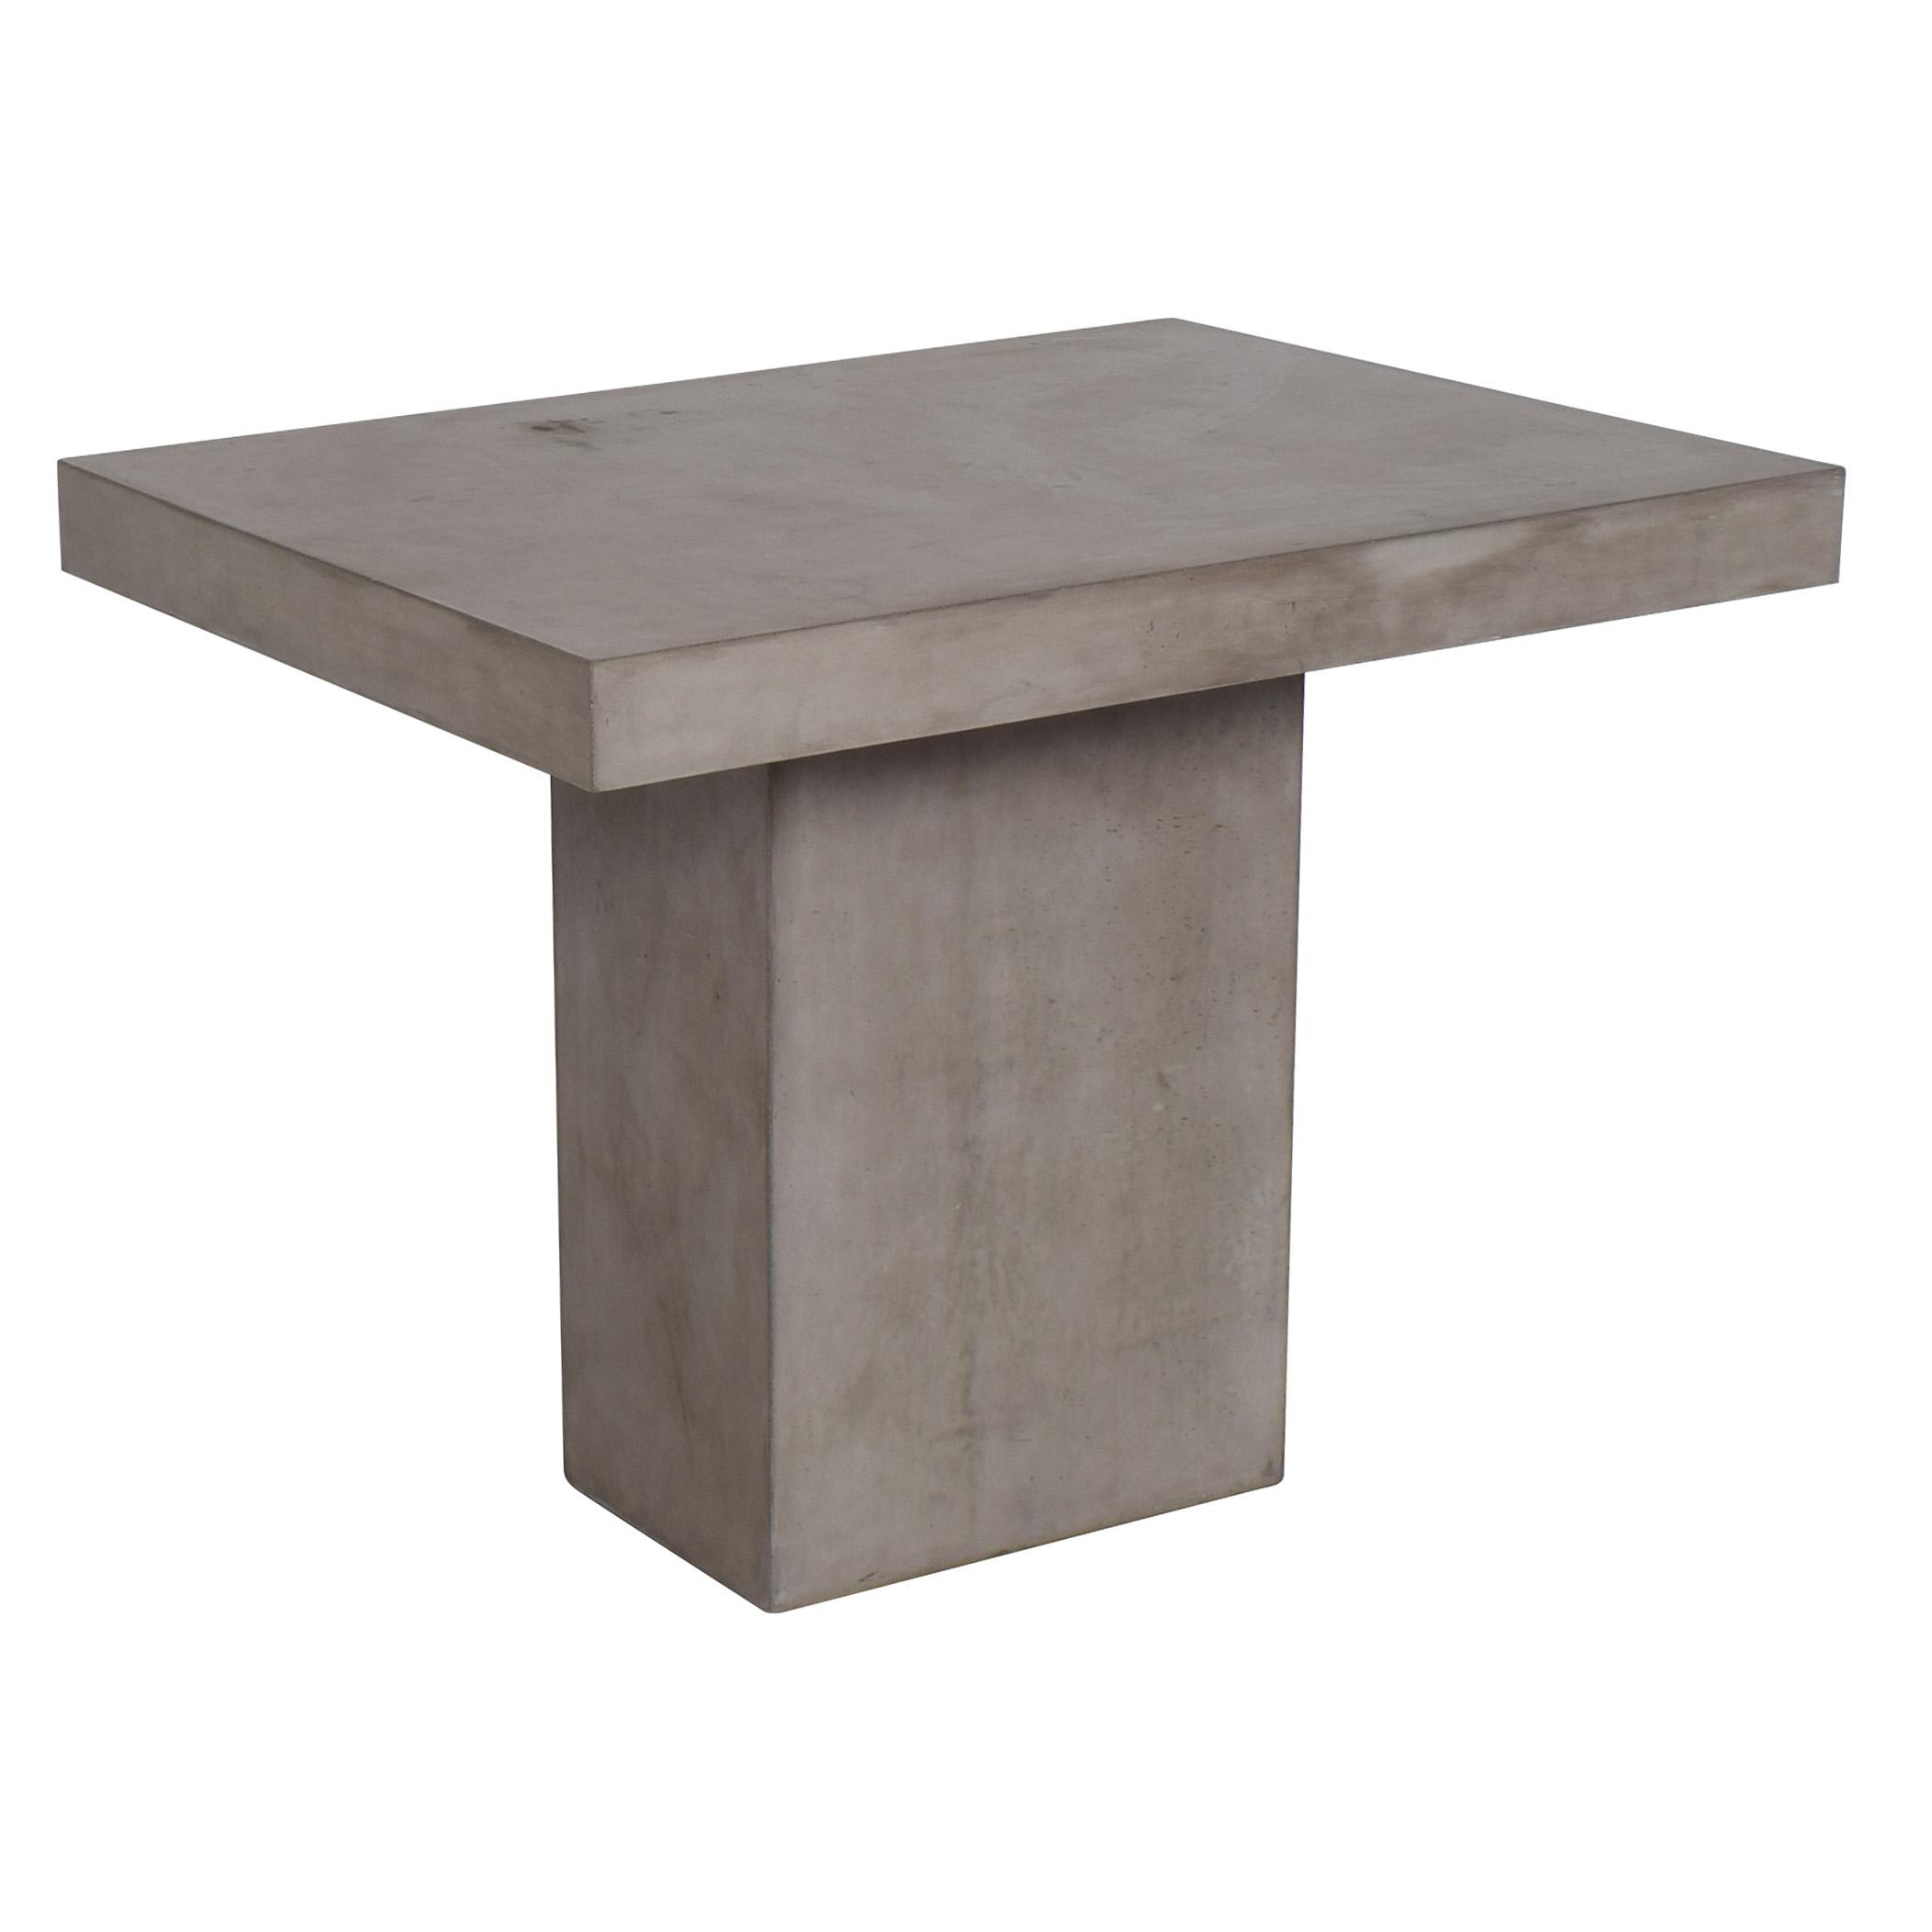 Seasonal Living Concrete Patio Table price